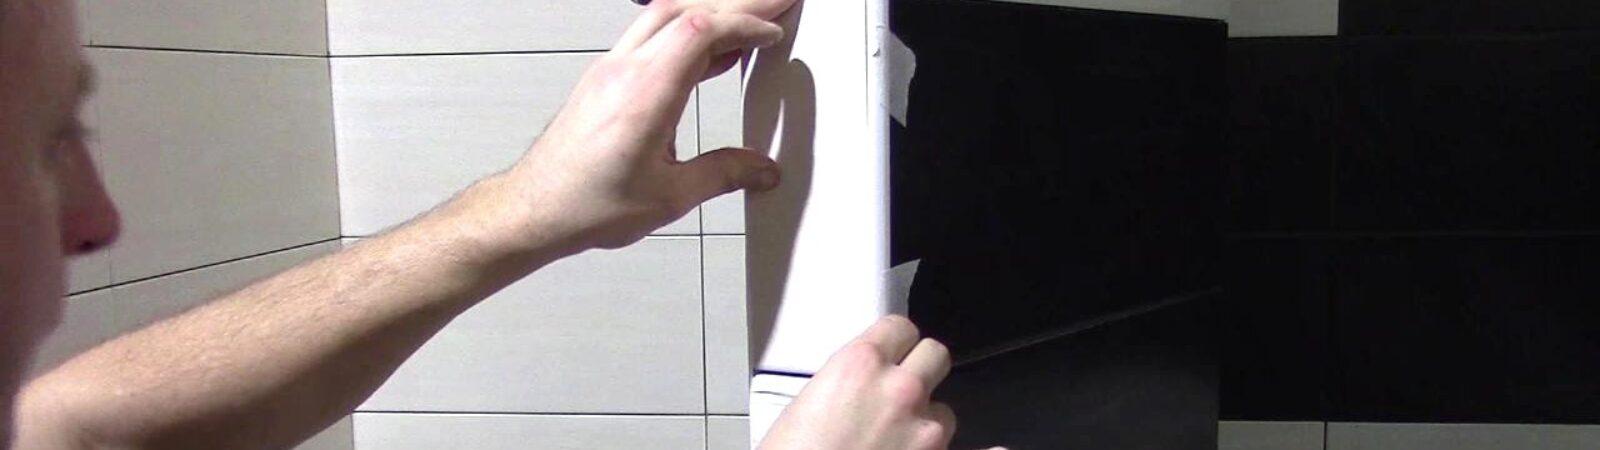 Установка уголков при укладке плитки